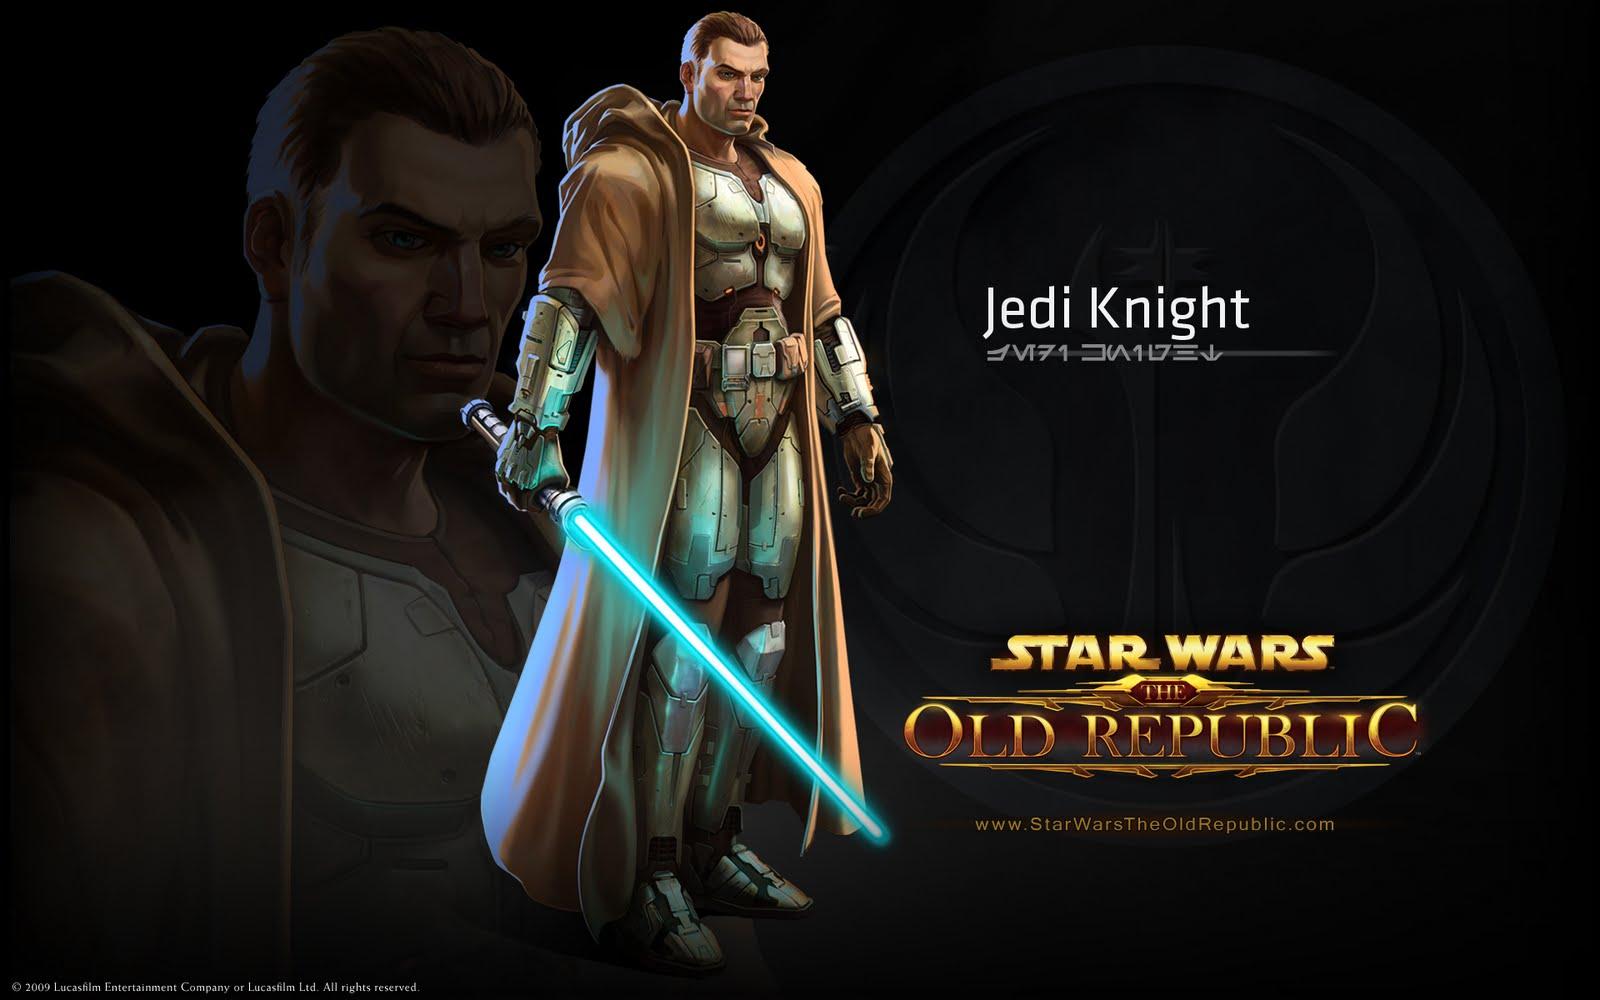 http://4.bp.blogspot.com/-6QVy9szxIHs/TjGkBf8yZRI/AAAAAAAAYsg/ysUyaMPObQQ/s1600/Star+Wars+-+The+Old+Republic+Wallpapers+%252835%2529.jpg